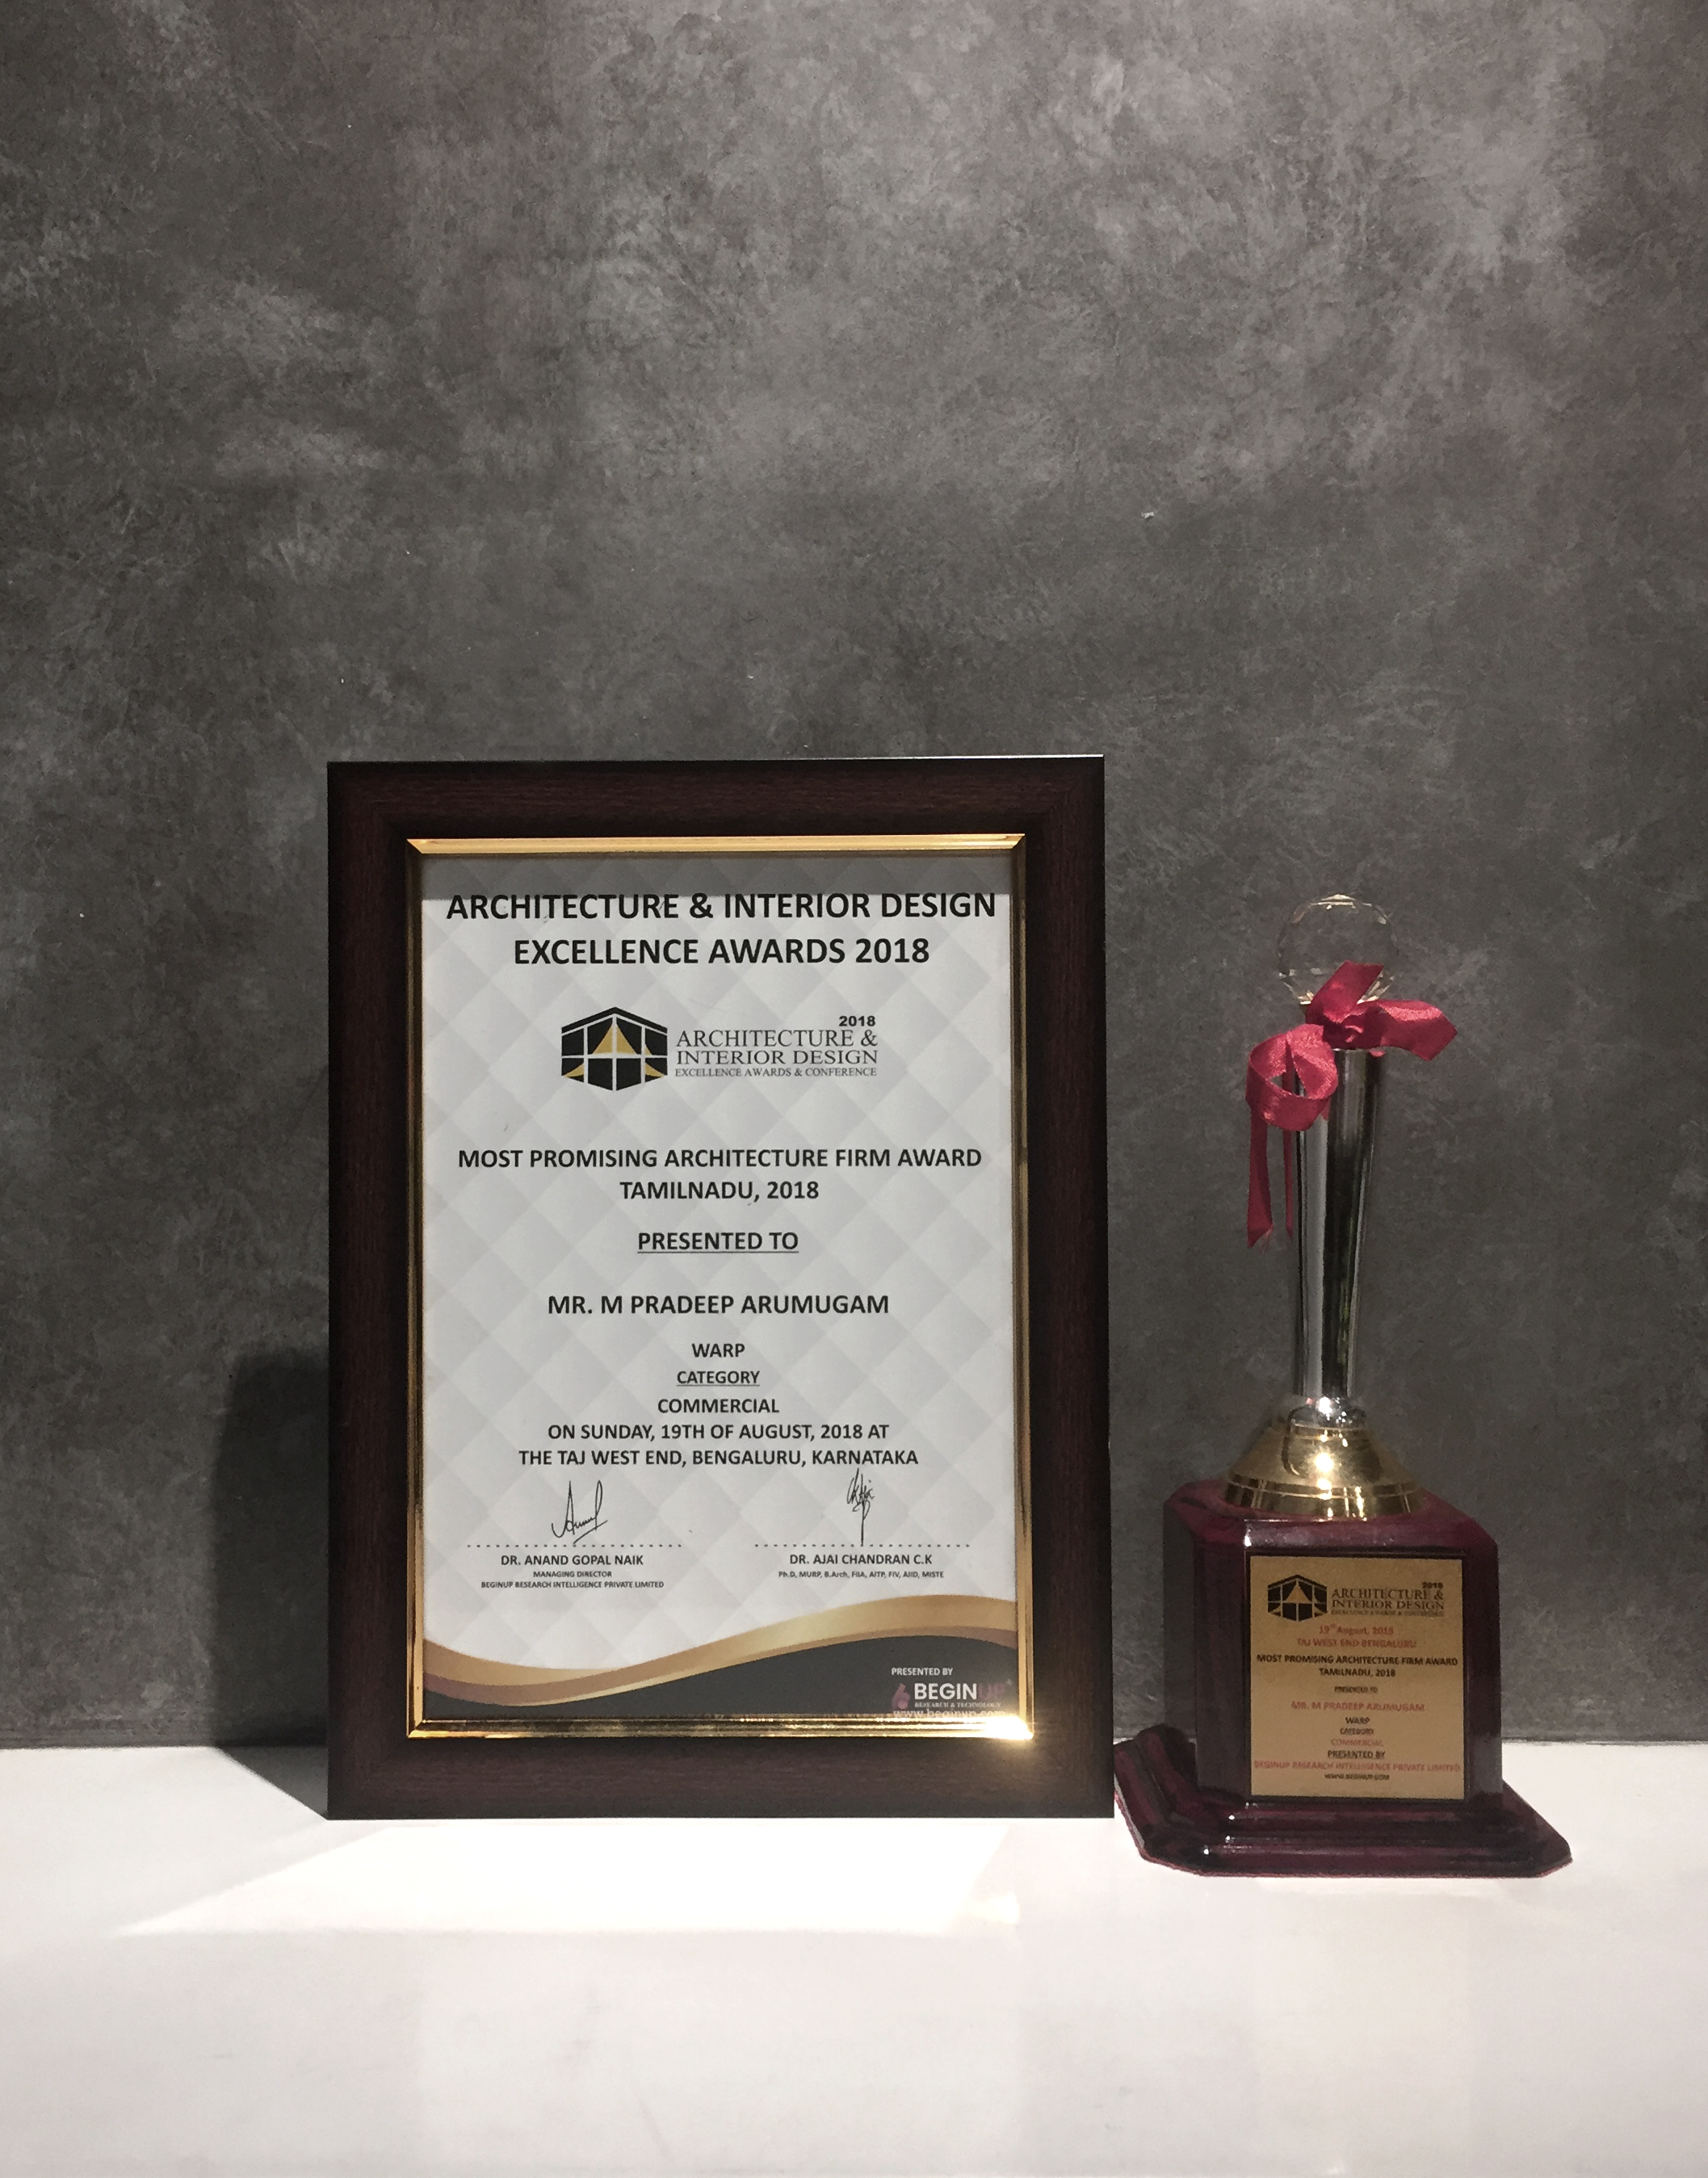 Architecture & Interior Design Excellence Award.jpg